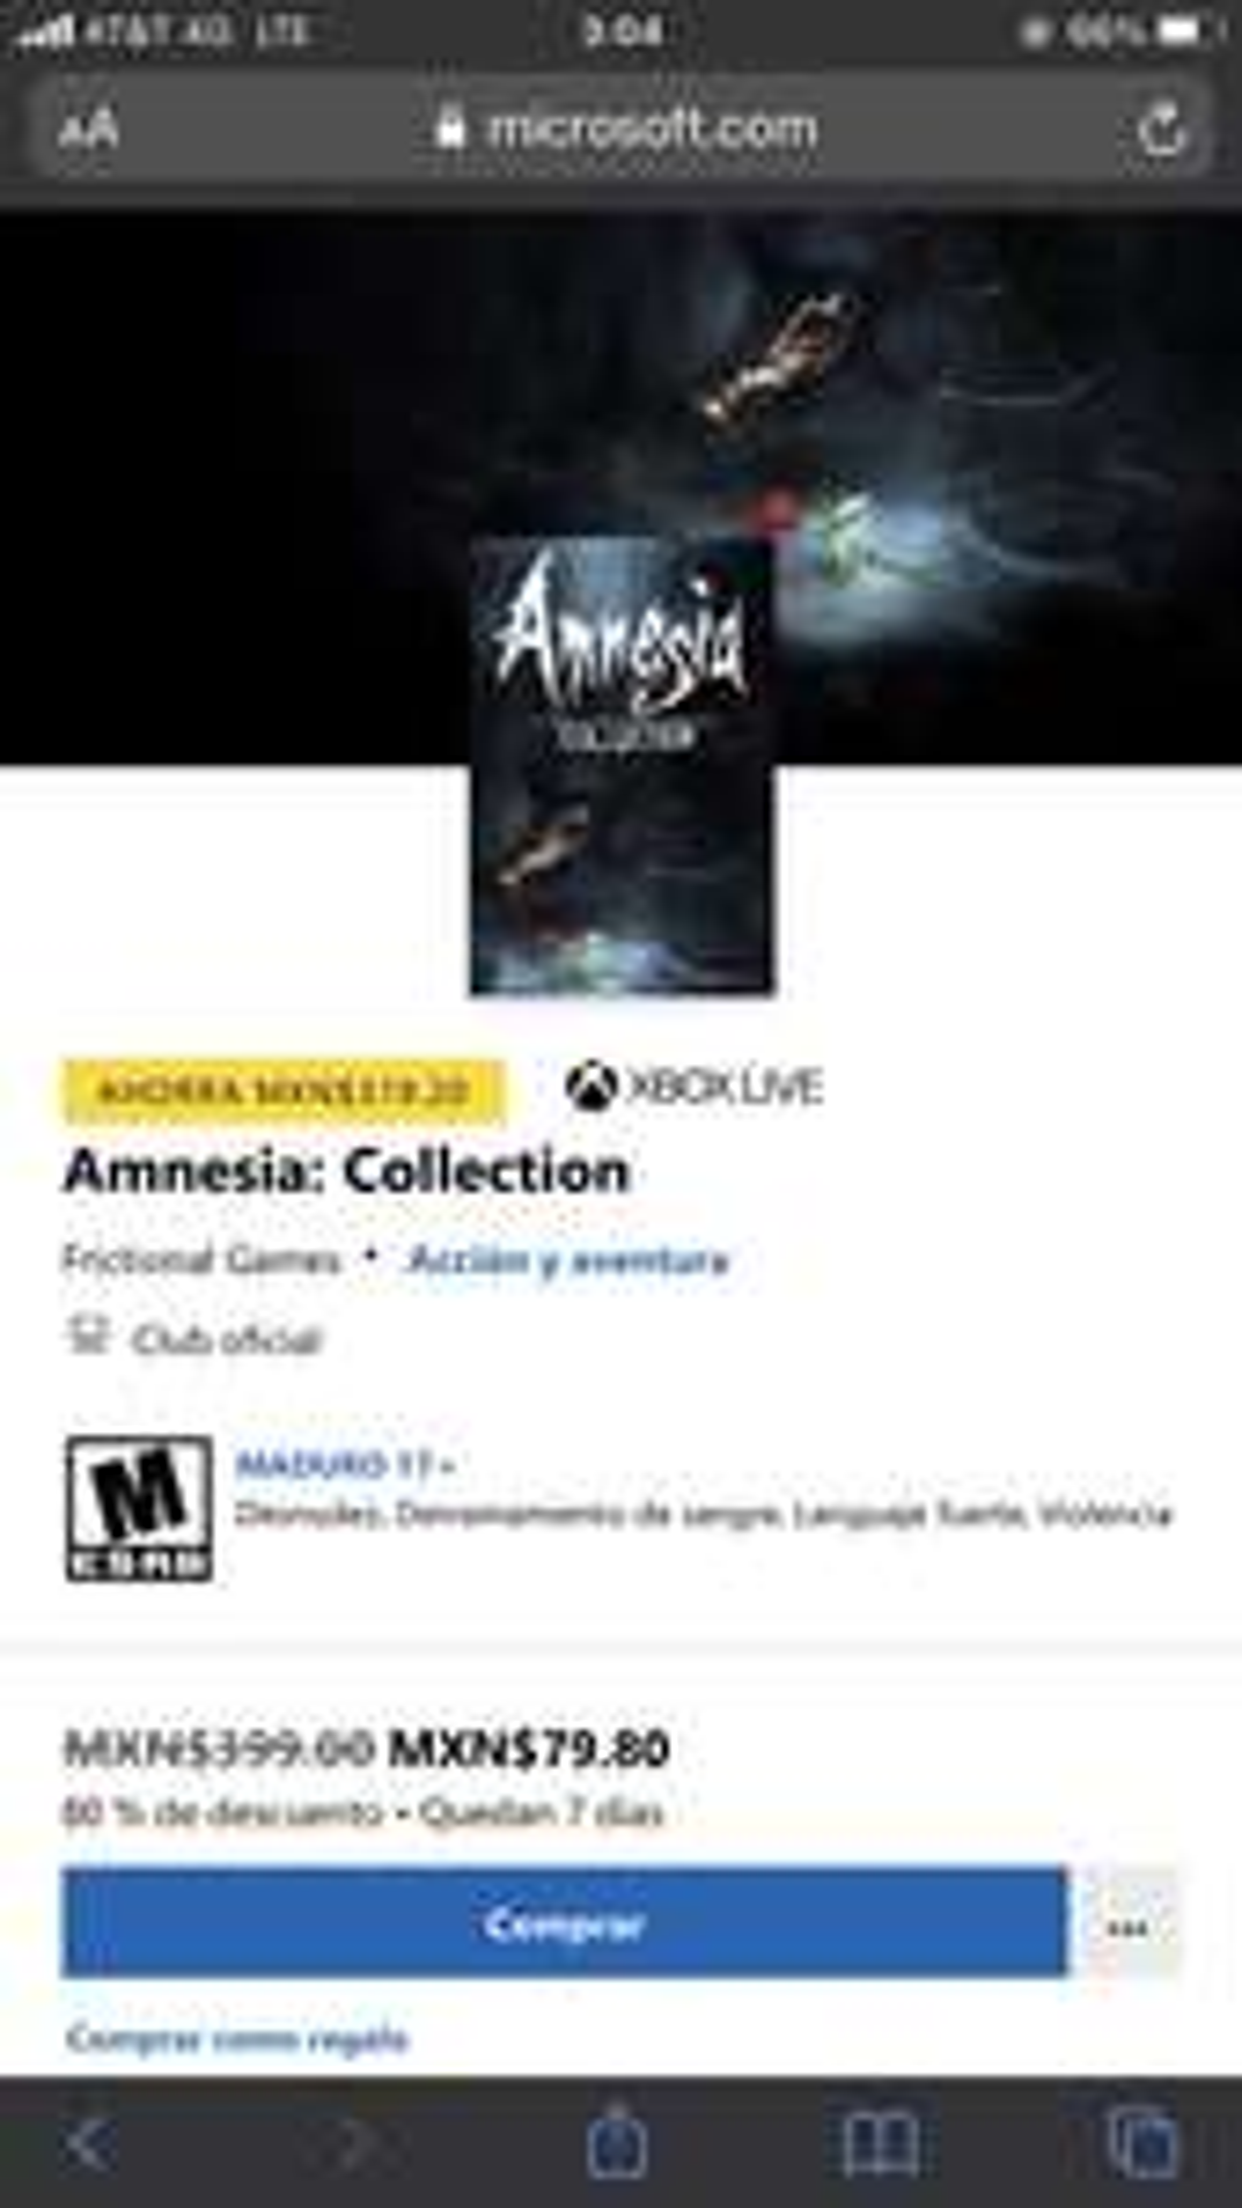 Xbox, Bundle Amnesia: Collection Xbox One/Series X S